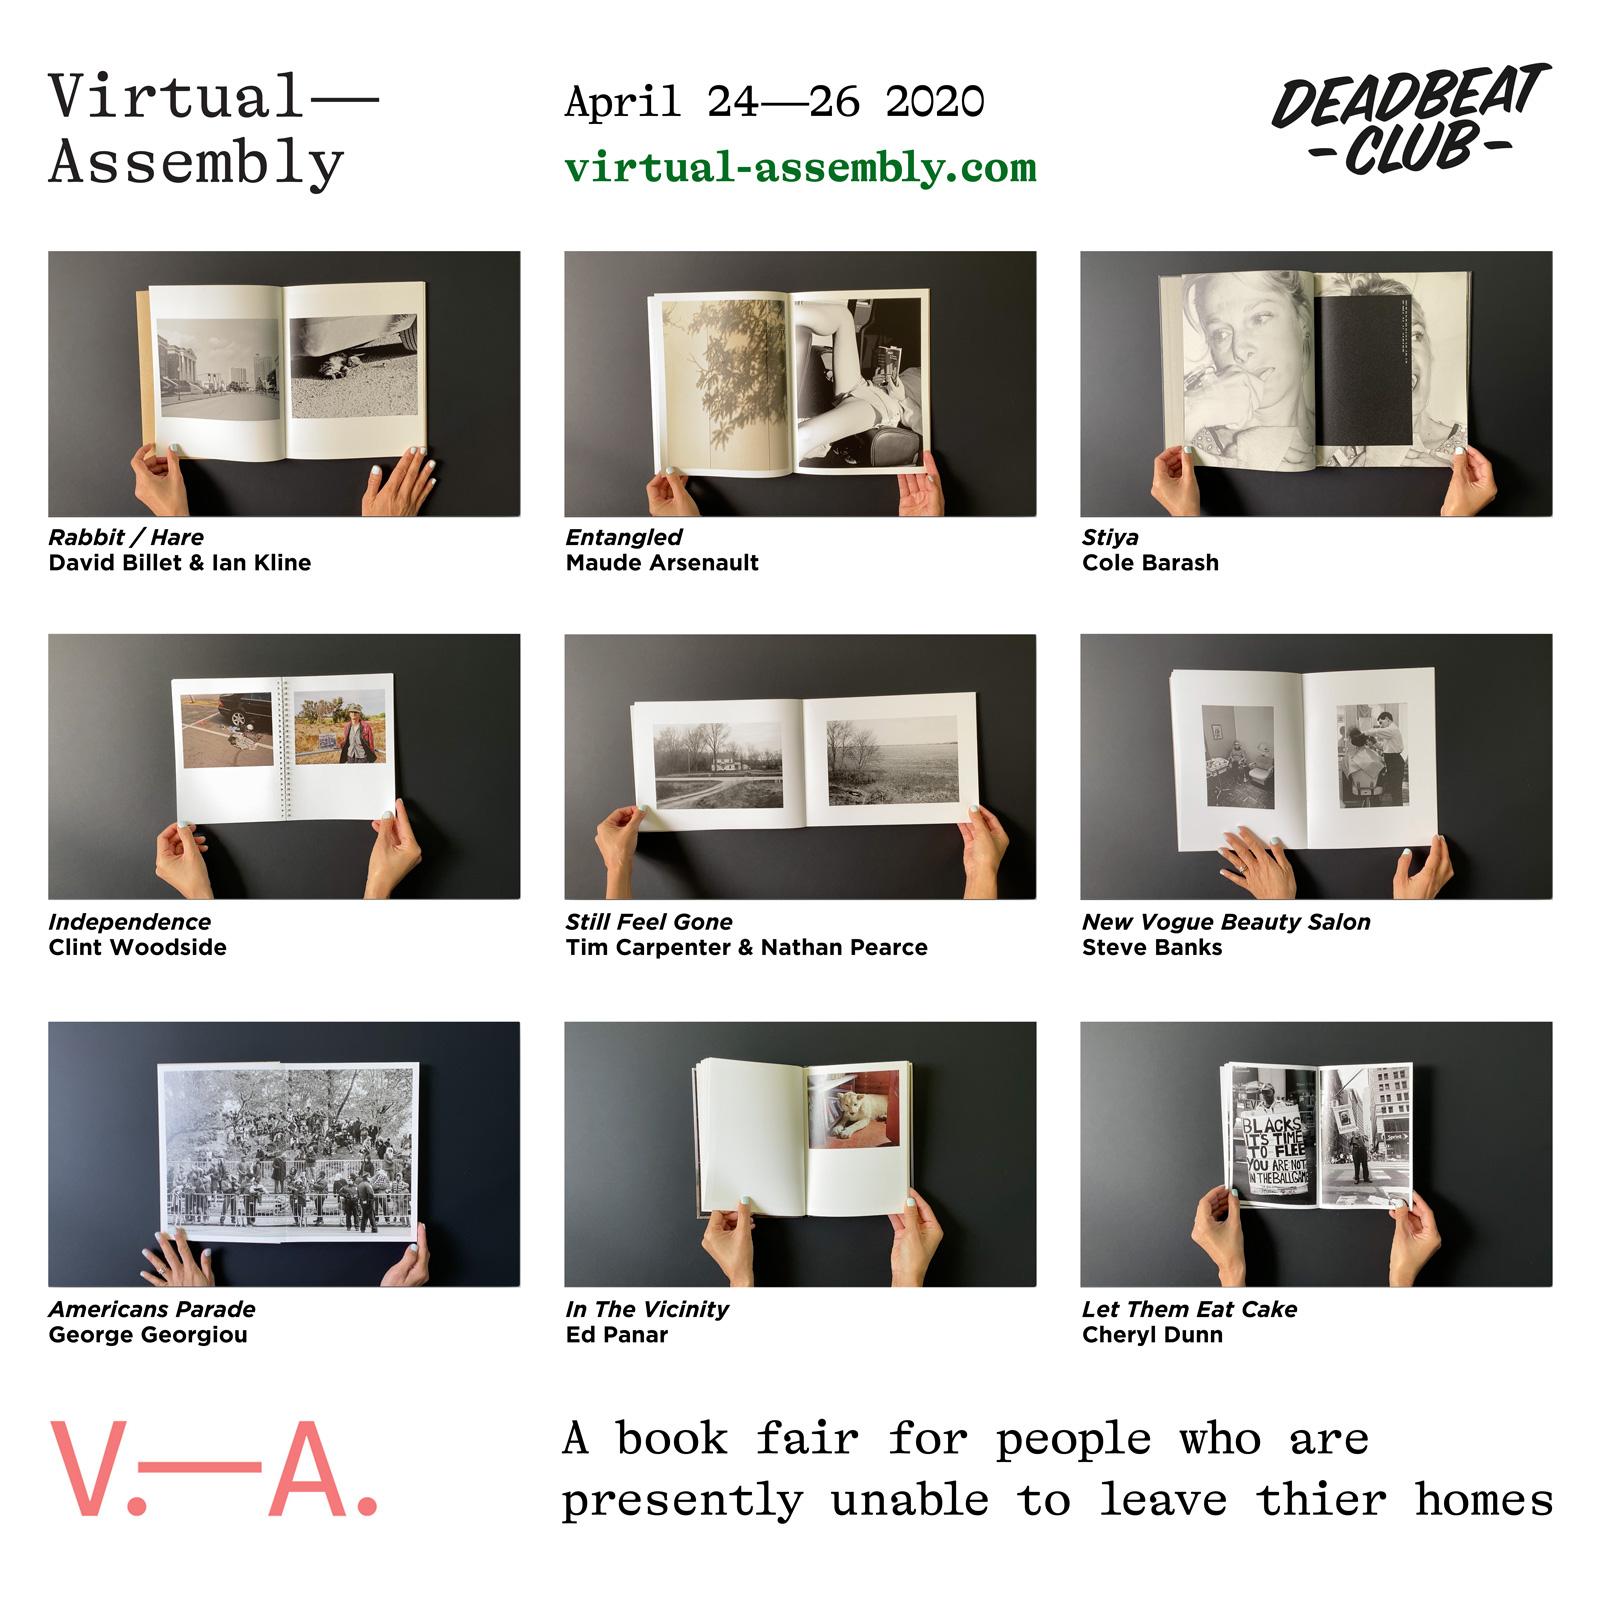 https://virtual-assembly.com